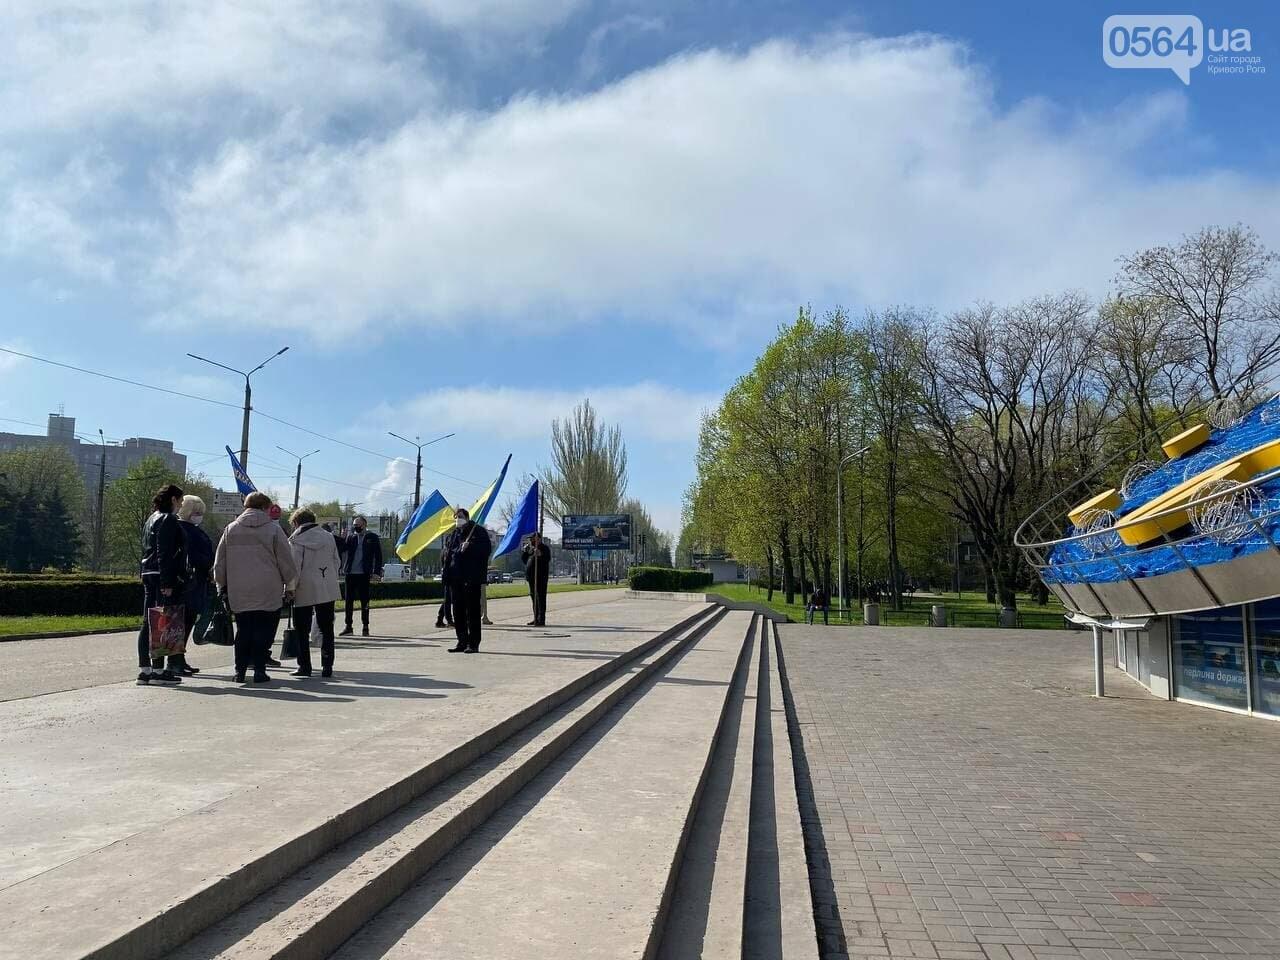 """Мир! Труд! Май!"", ""Зарплату 1000 евро!"", - криворожане вышли на первомайский марш, - ФОТО, ВИДЕО , фото-11"